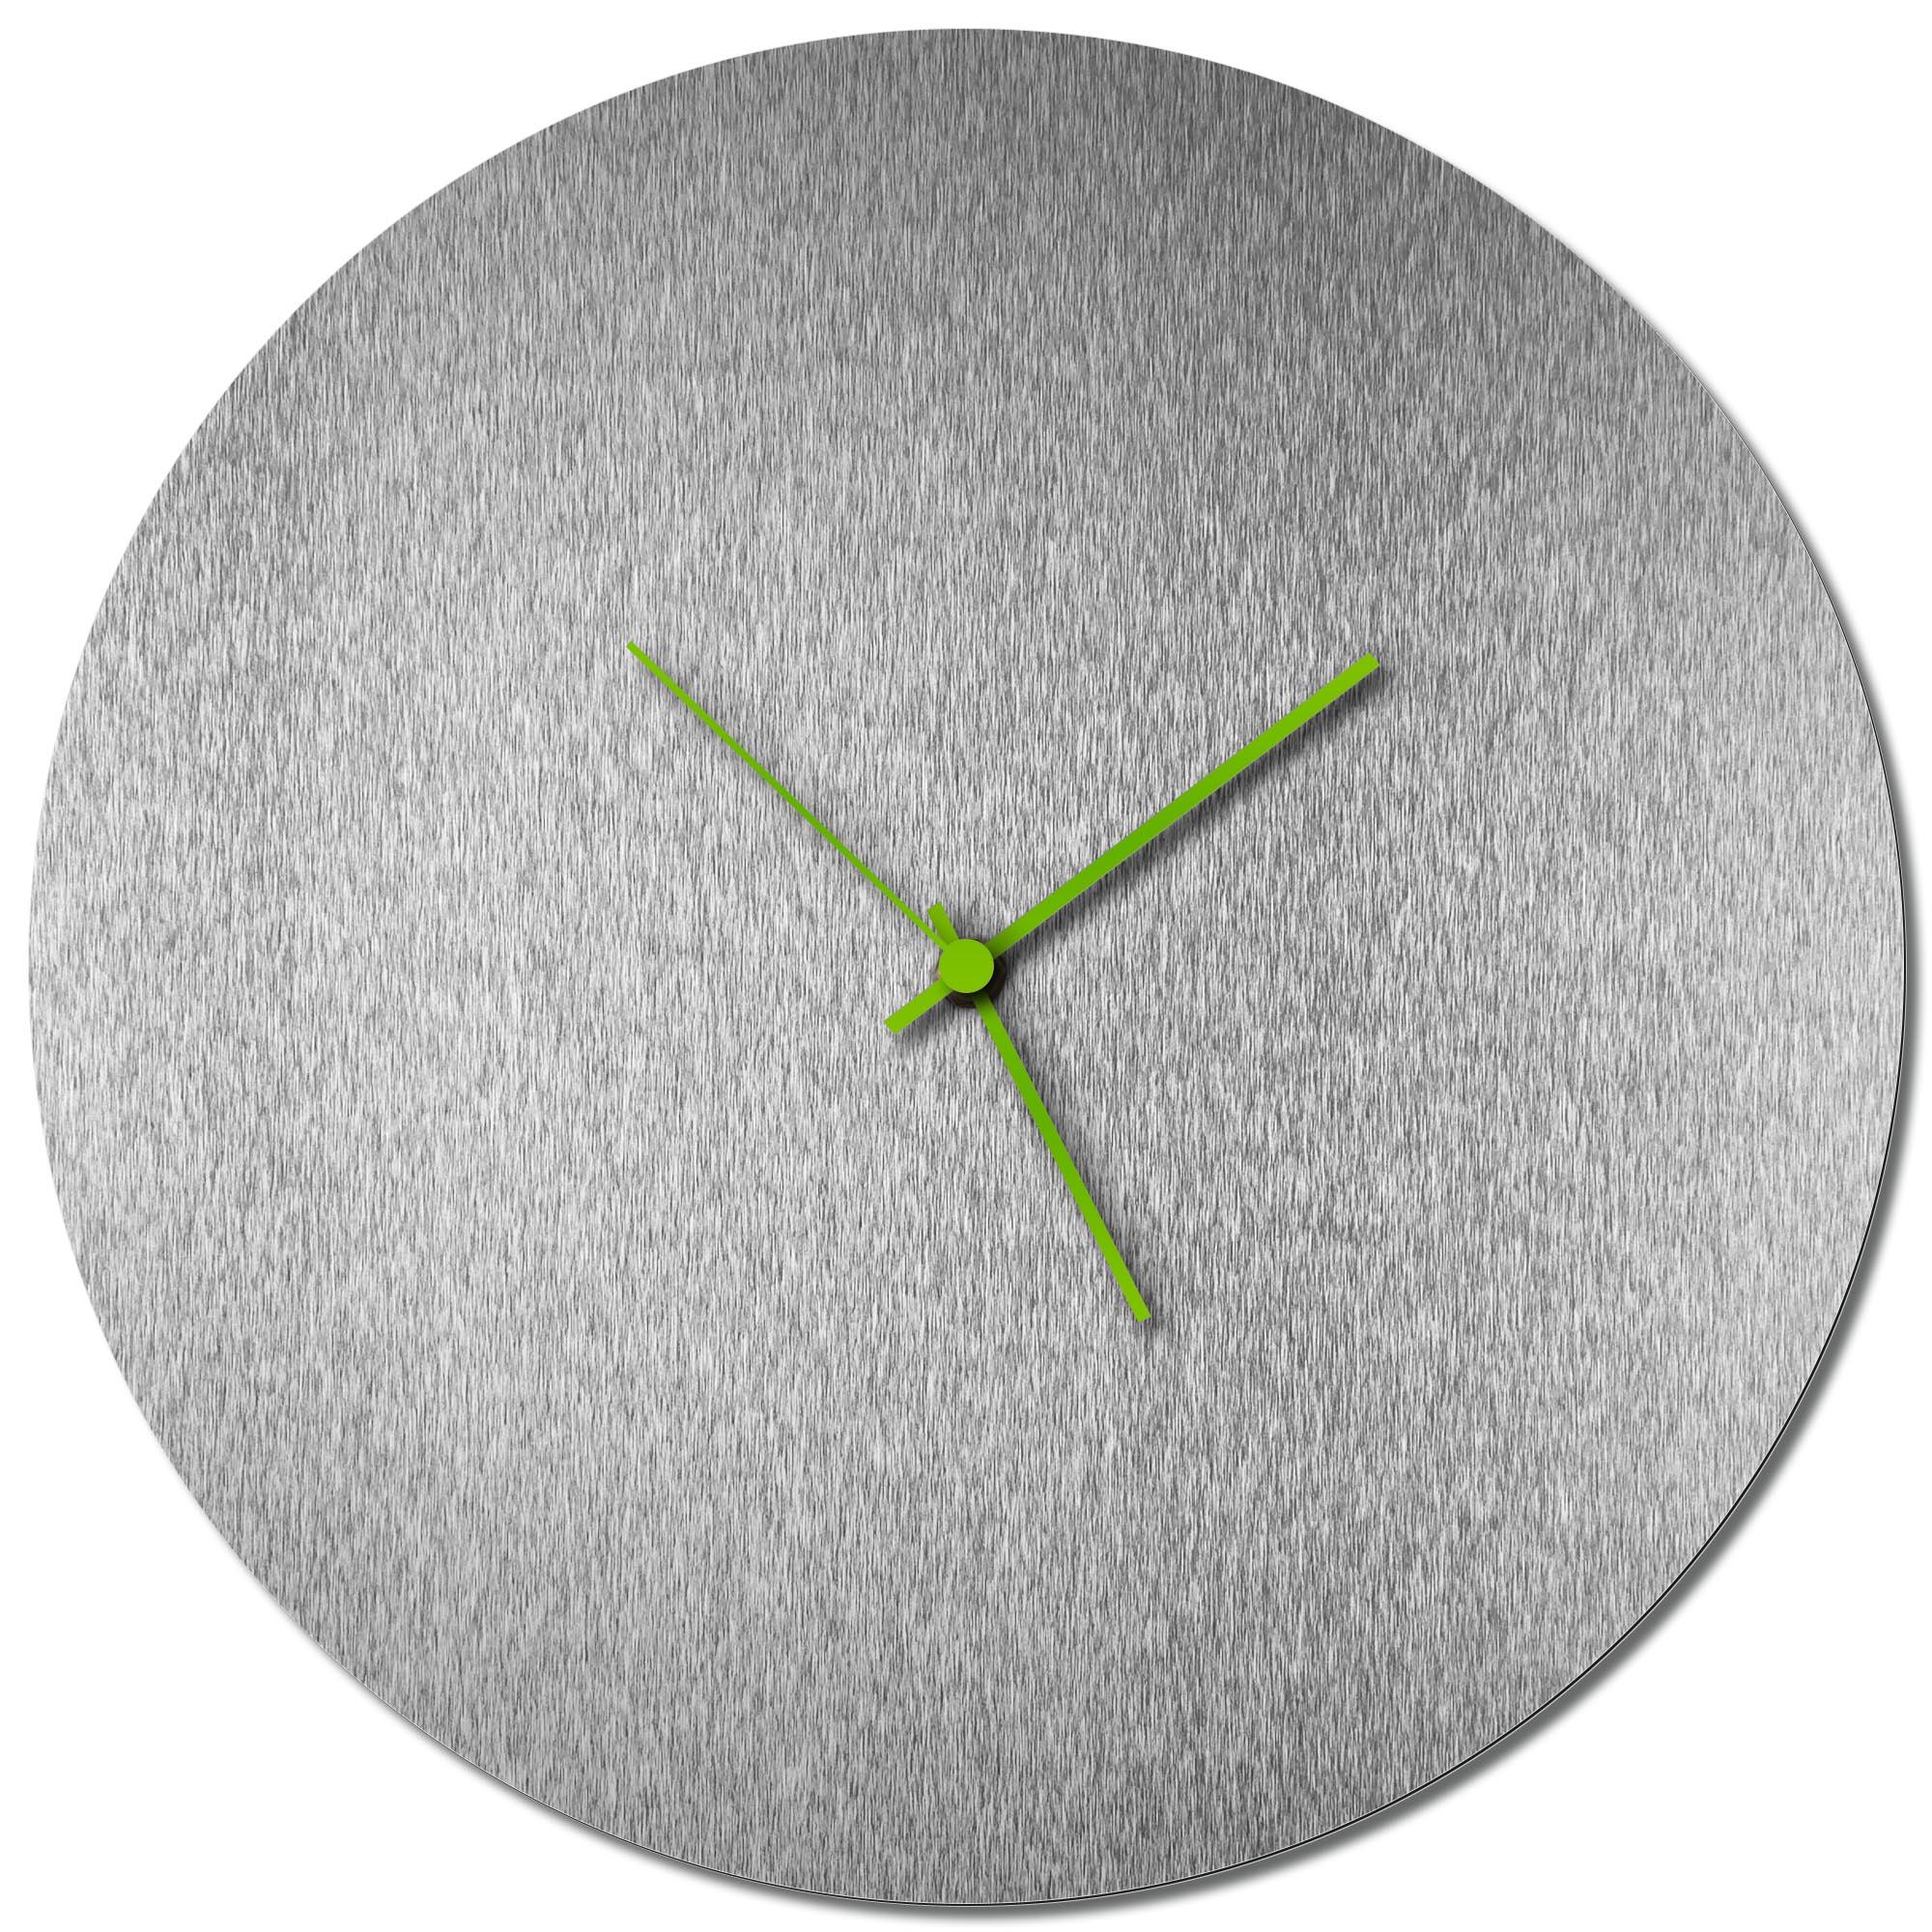 Adam Schwoeppe 'Silversmith Circle Clock Green' Midcentury Modern Style Wall Clock